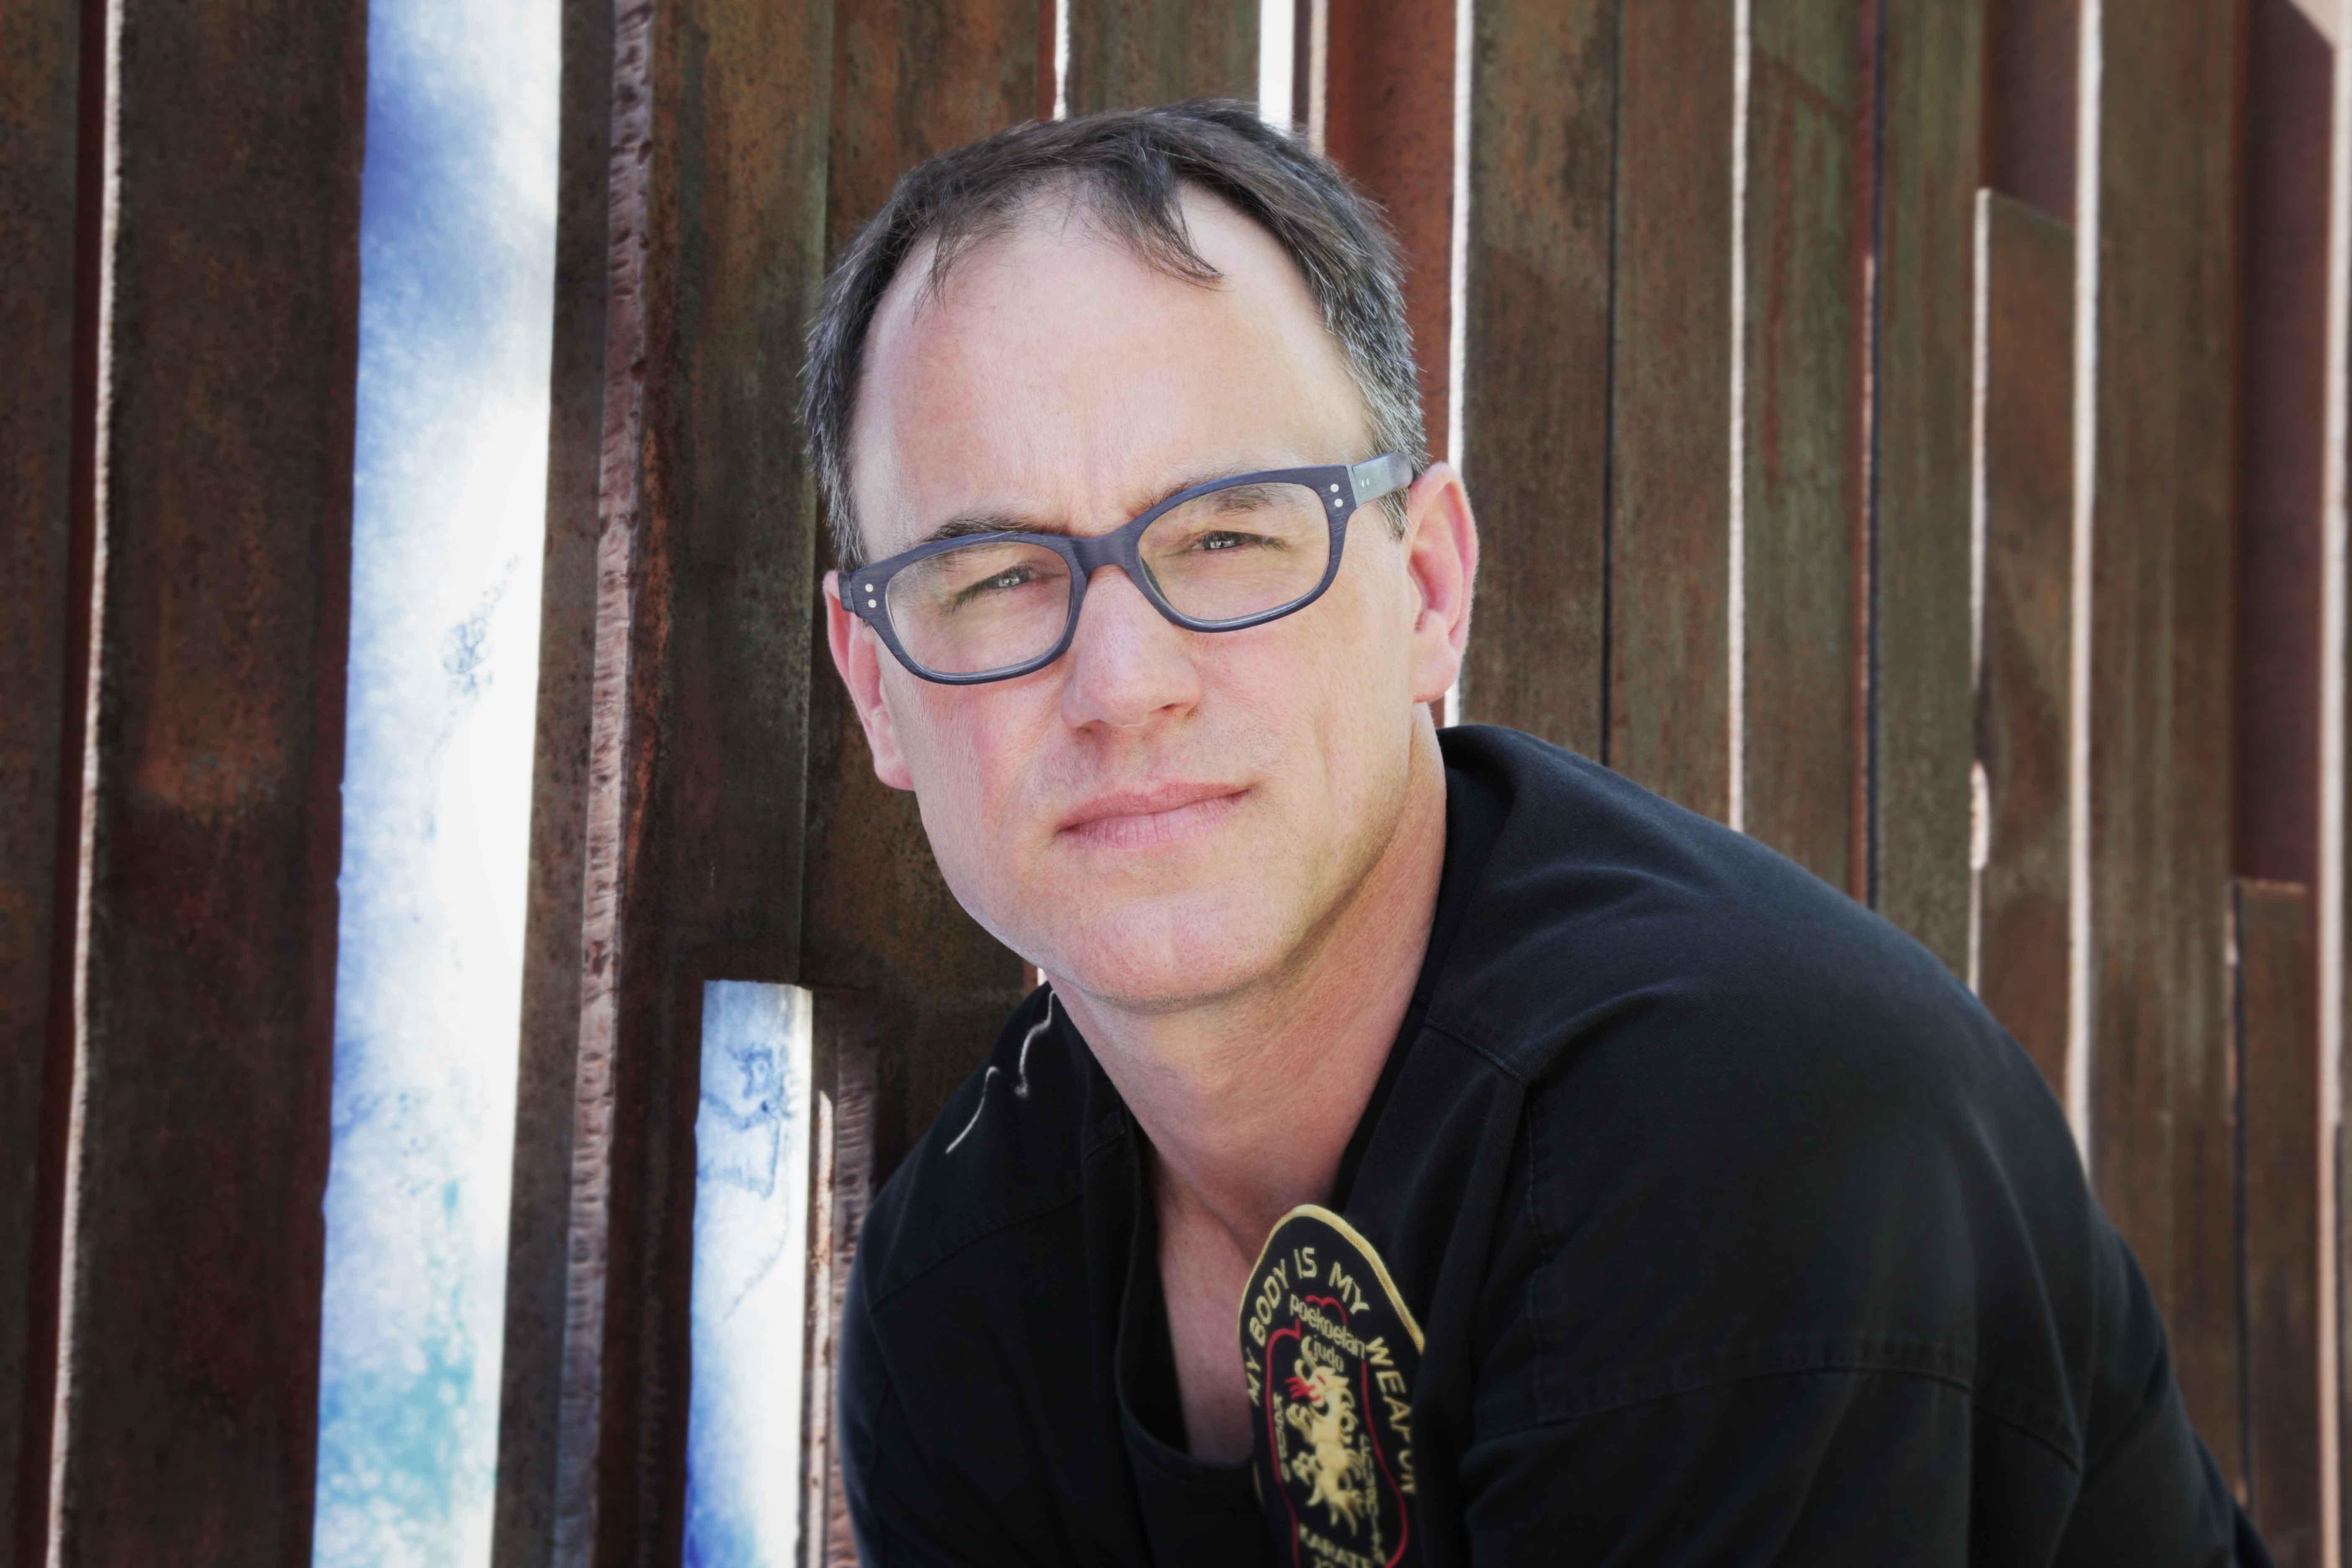 Head Instructor Jeffrey Denson's heashot